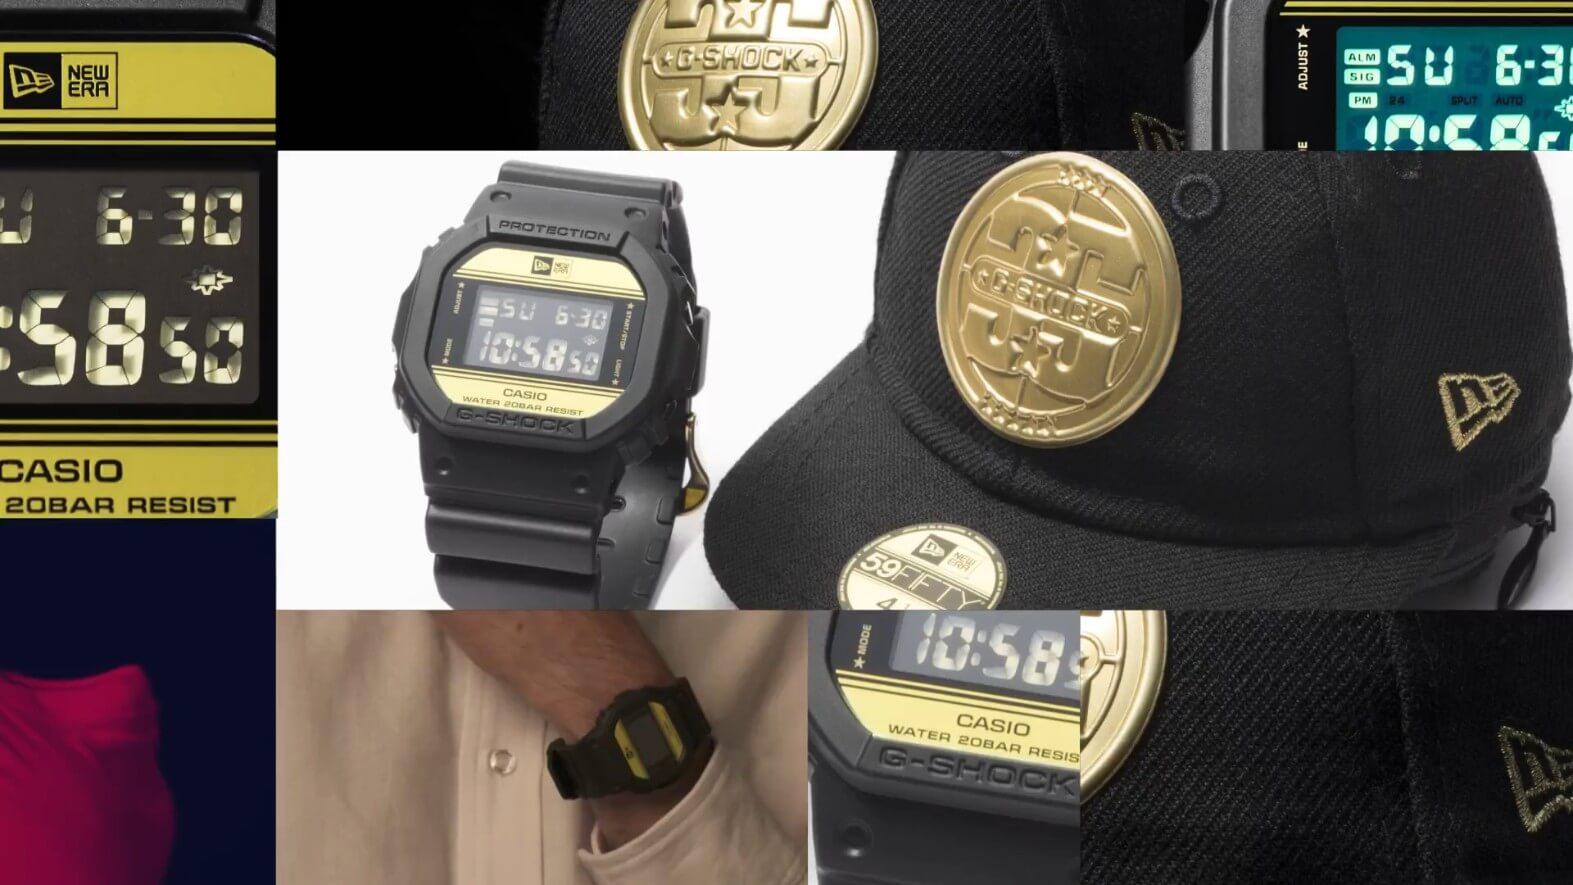 New Era x G-Shock DW-5600NE-1 for 35th Anniversary 2018 (DW5600NE-1 ... 6e80689afc08